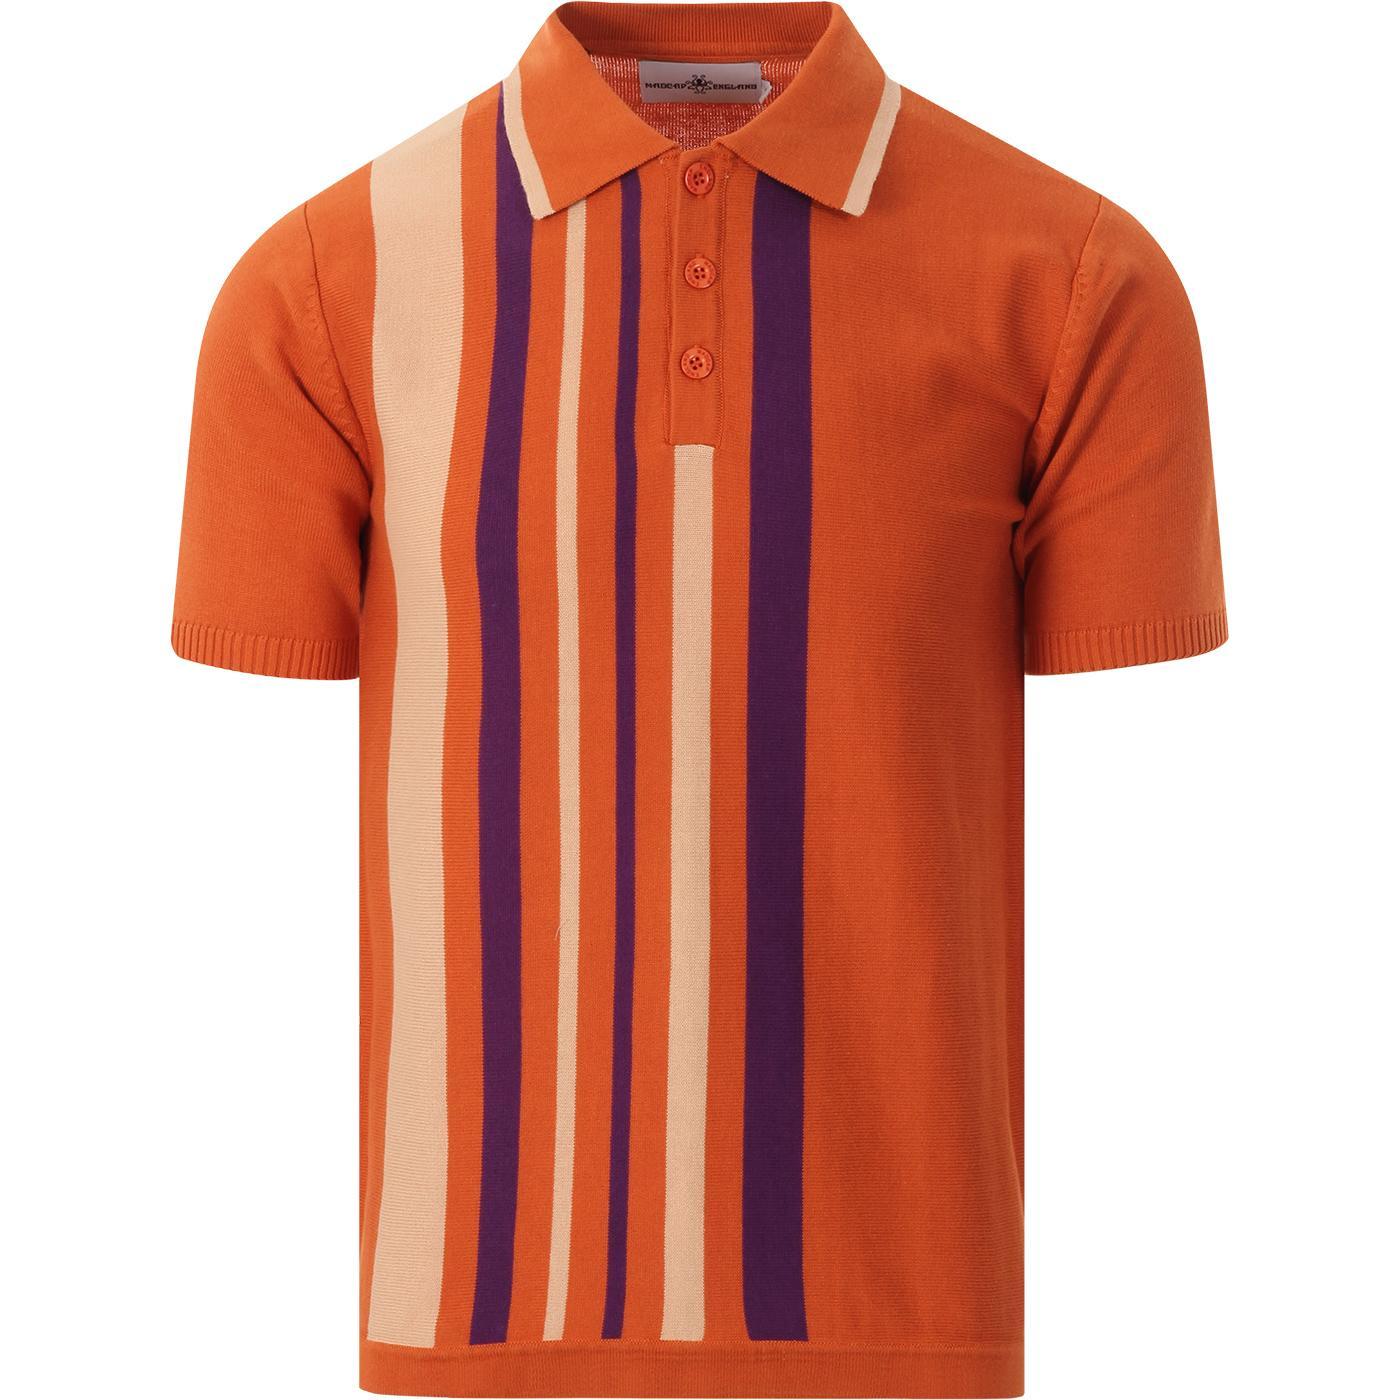 Bauhaus MADCAP ENGLAND Mod Stripe Knit Polo (Rust)